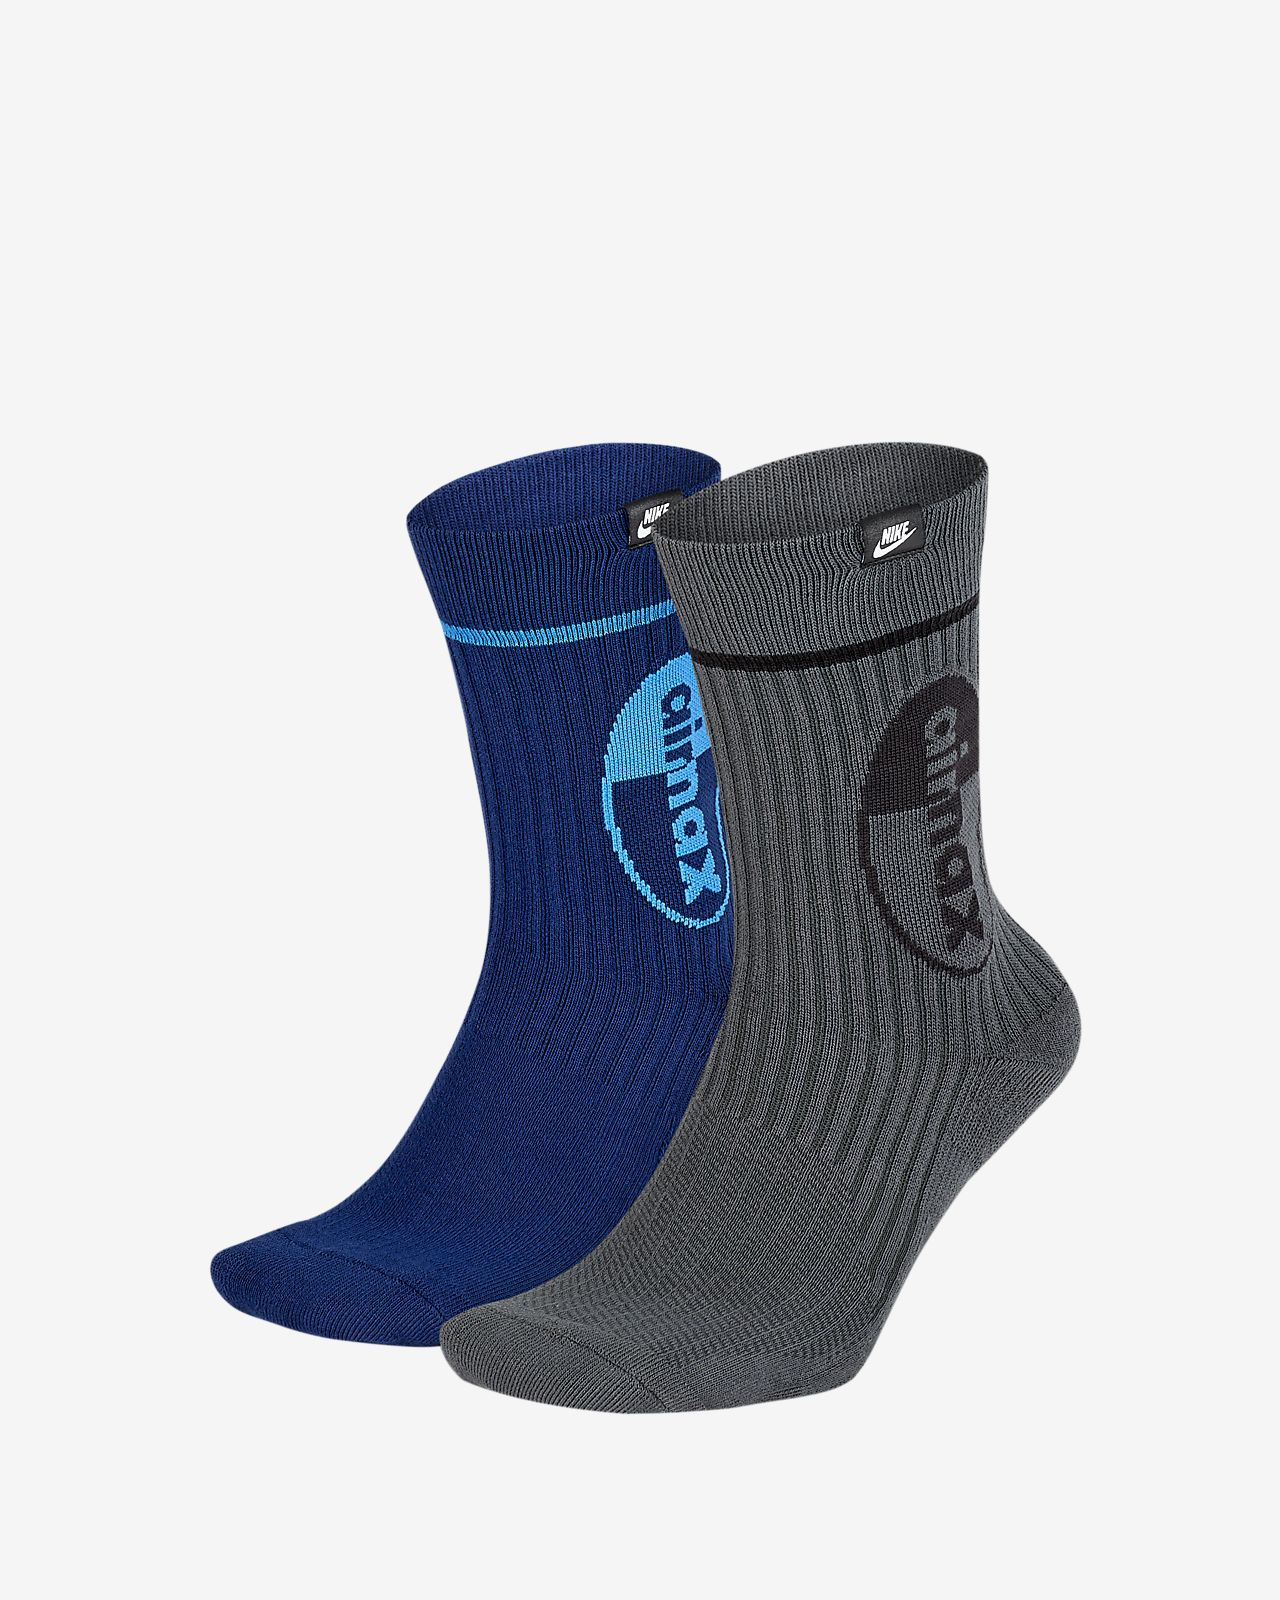 Nike SNKR Sox Air Max Crew Socks (2 Pairs)